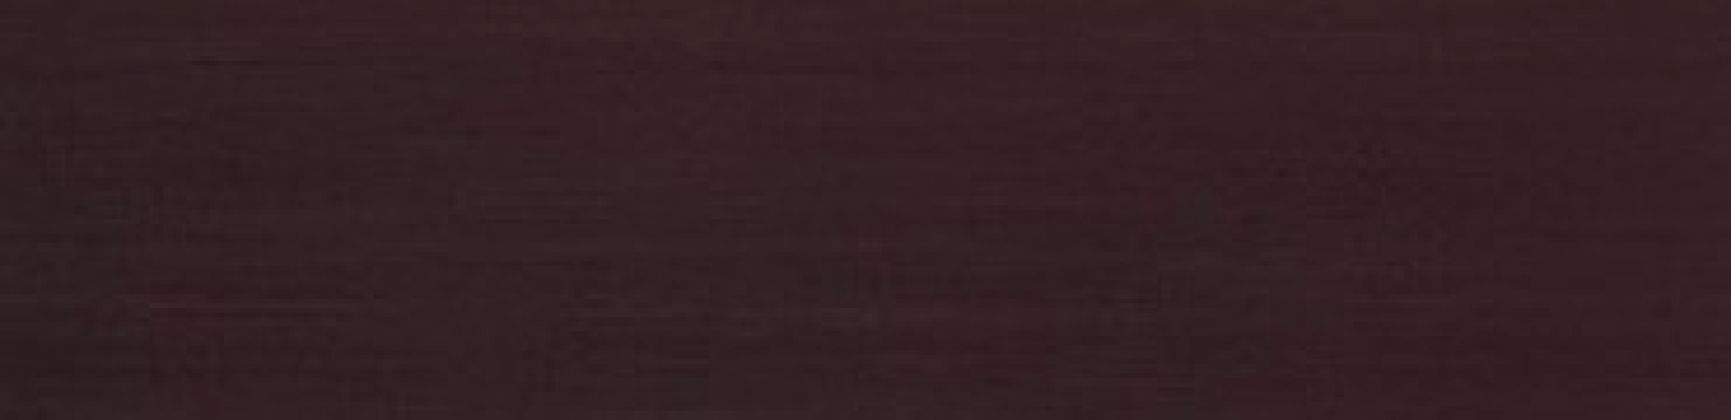 Sublimage Sienna 20x80